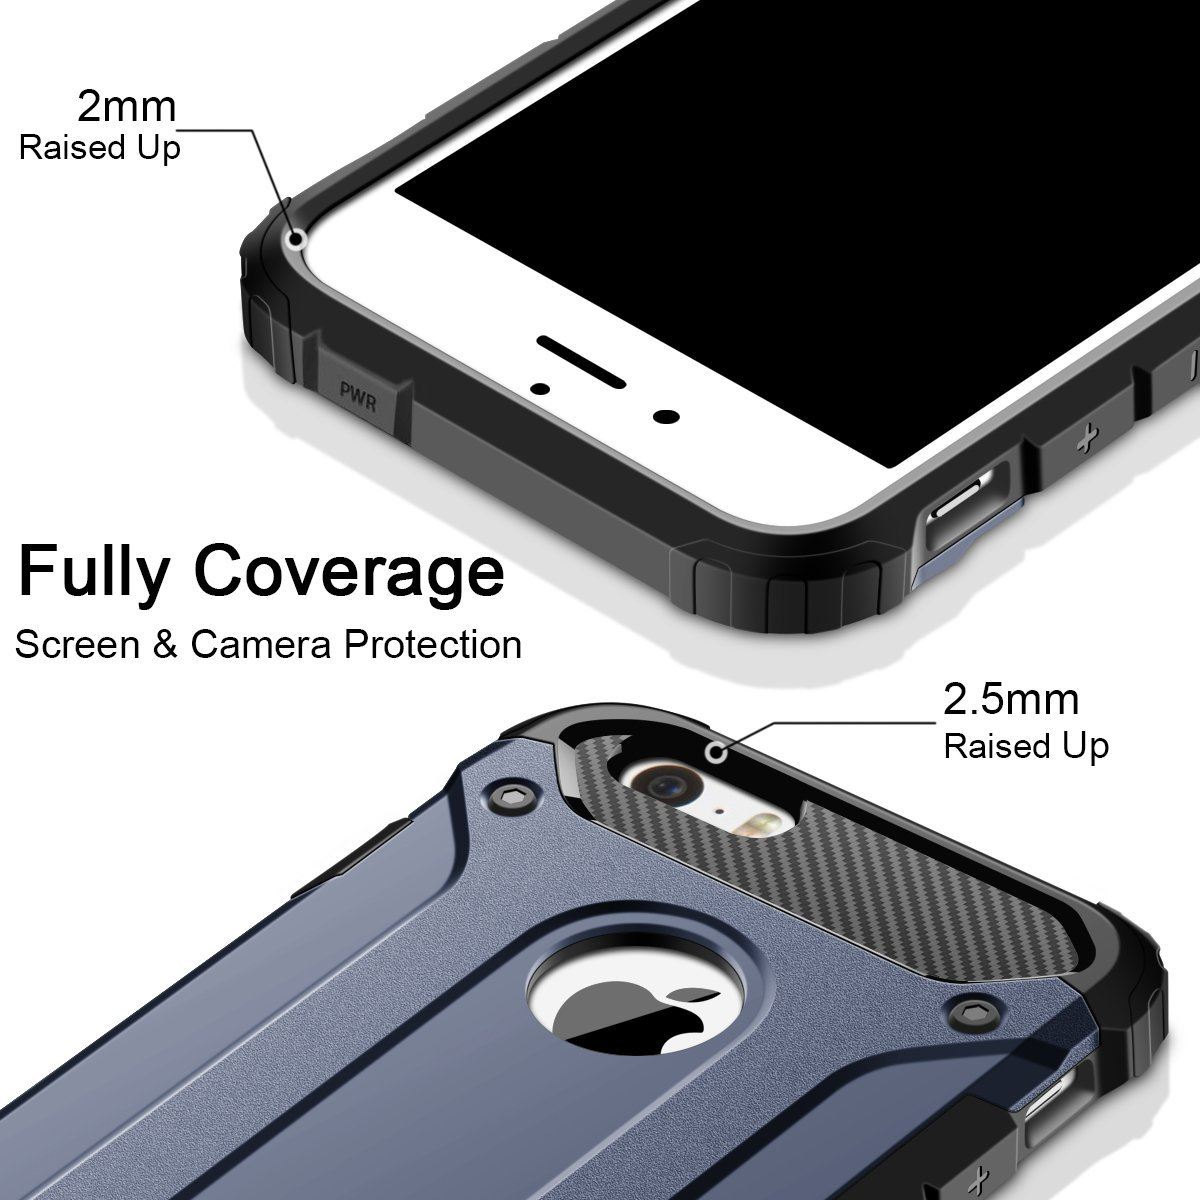 thumbnail 51 - For Apple iPhone 11 Pro Max XR Xs X 8 7 Plus 6 5 Se Case Cover Impact Heavy Duty